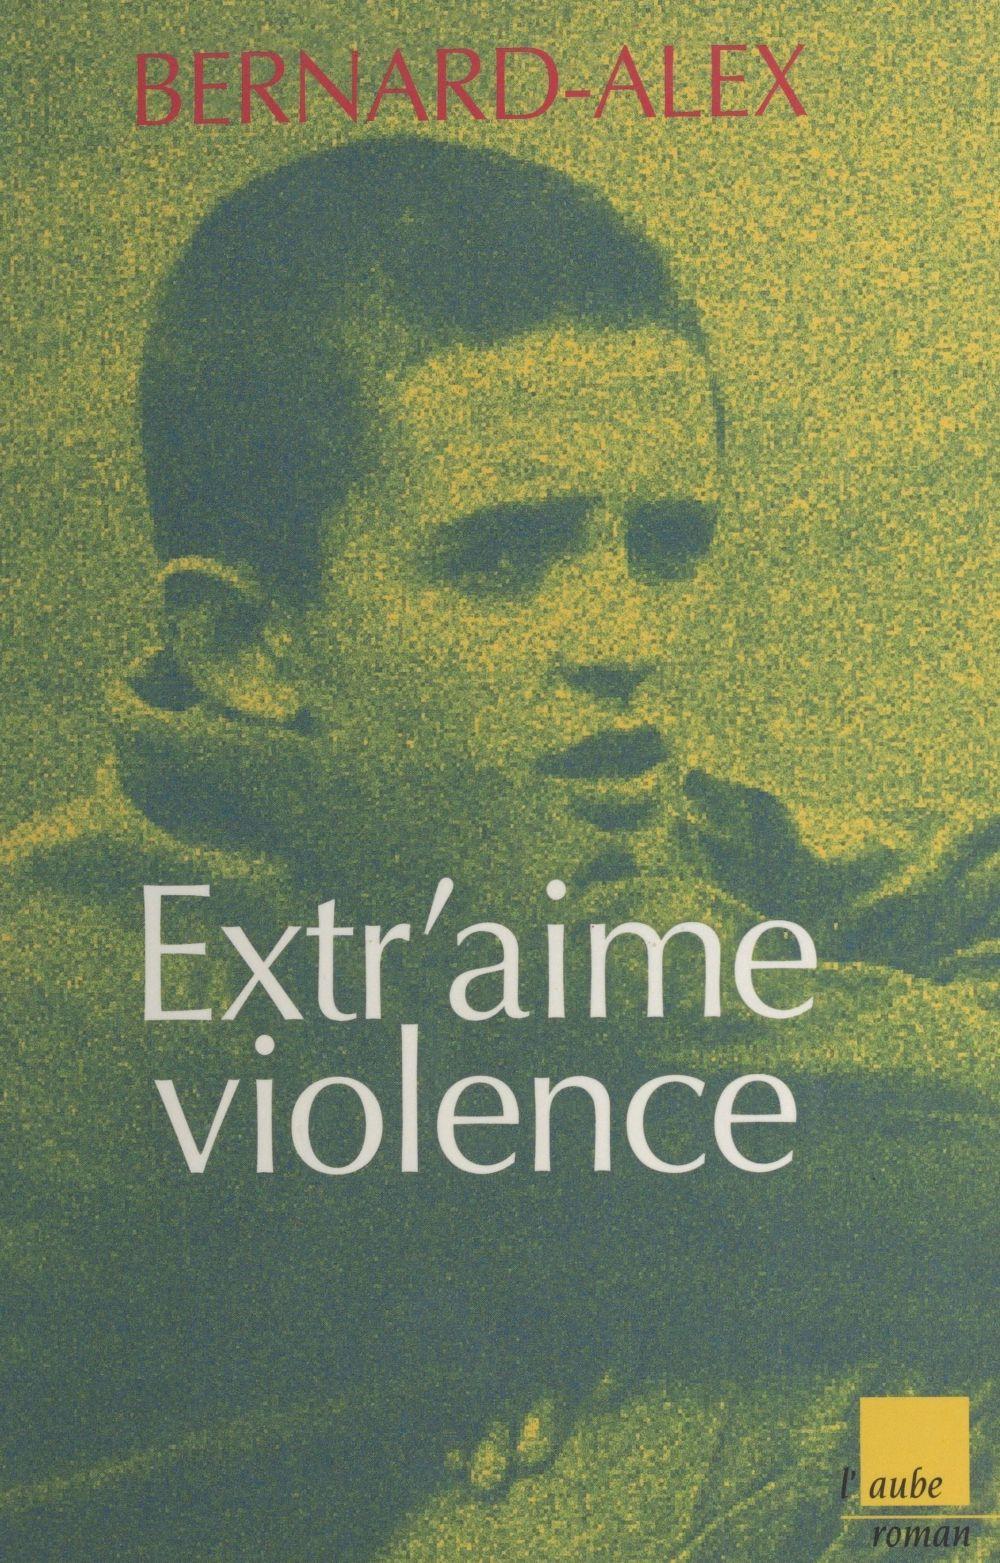 Extr'aime violence